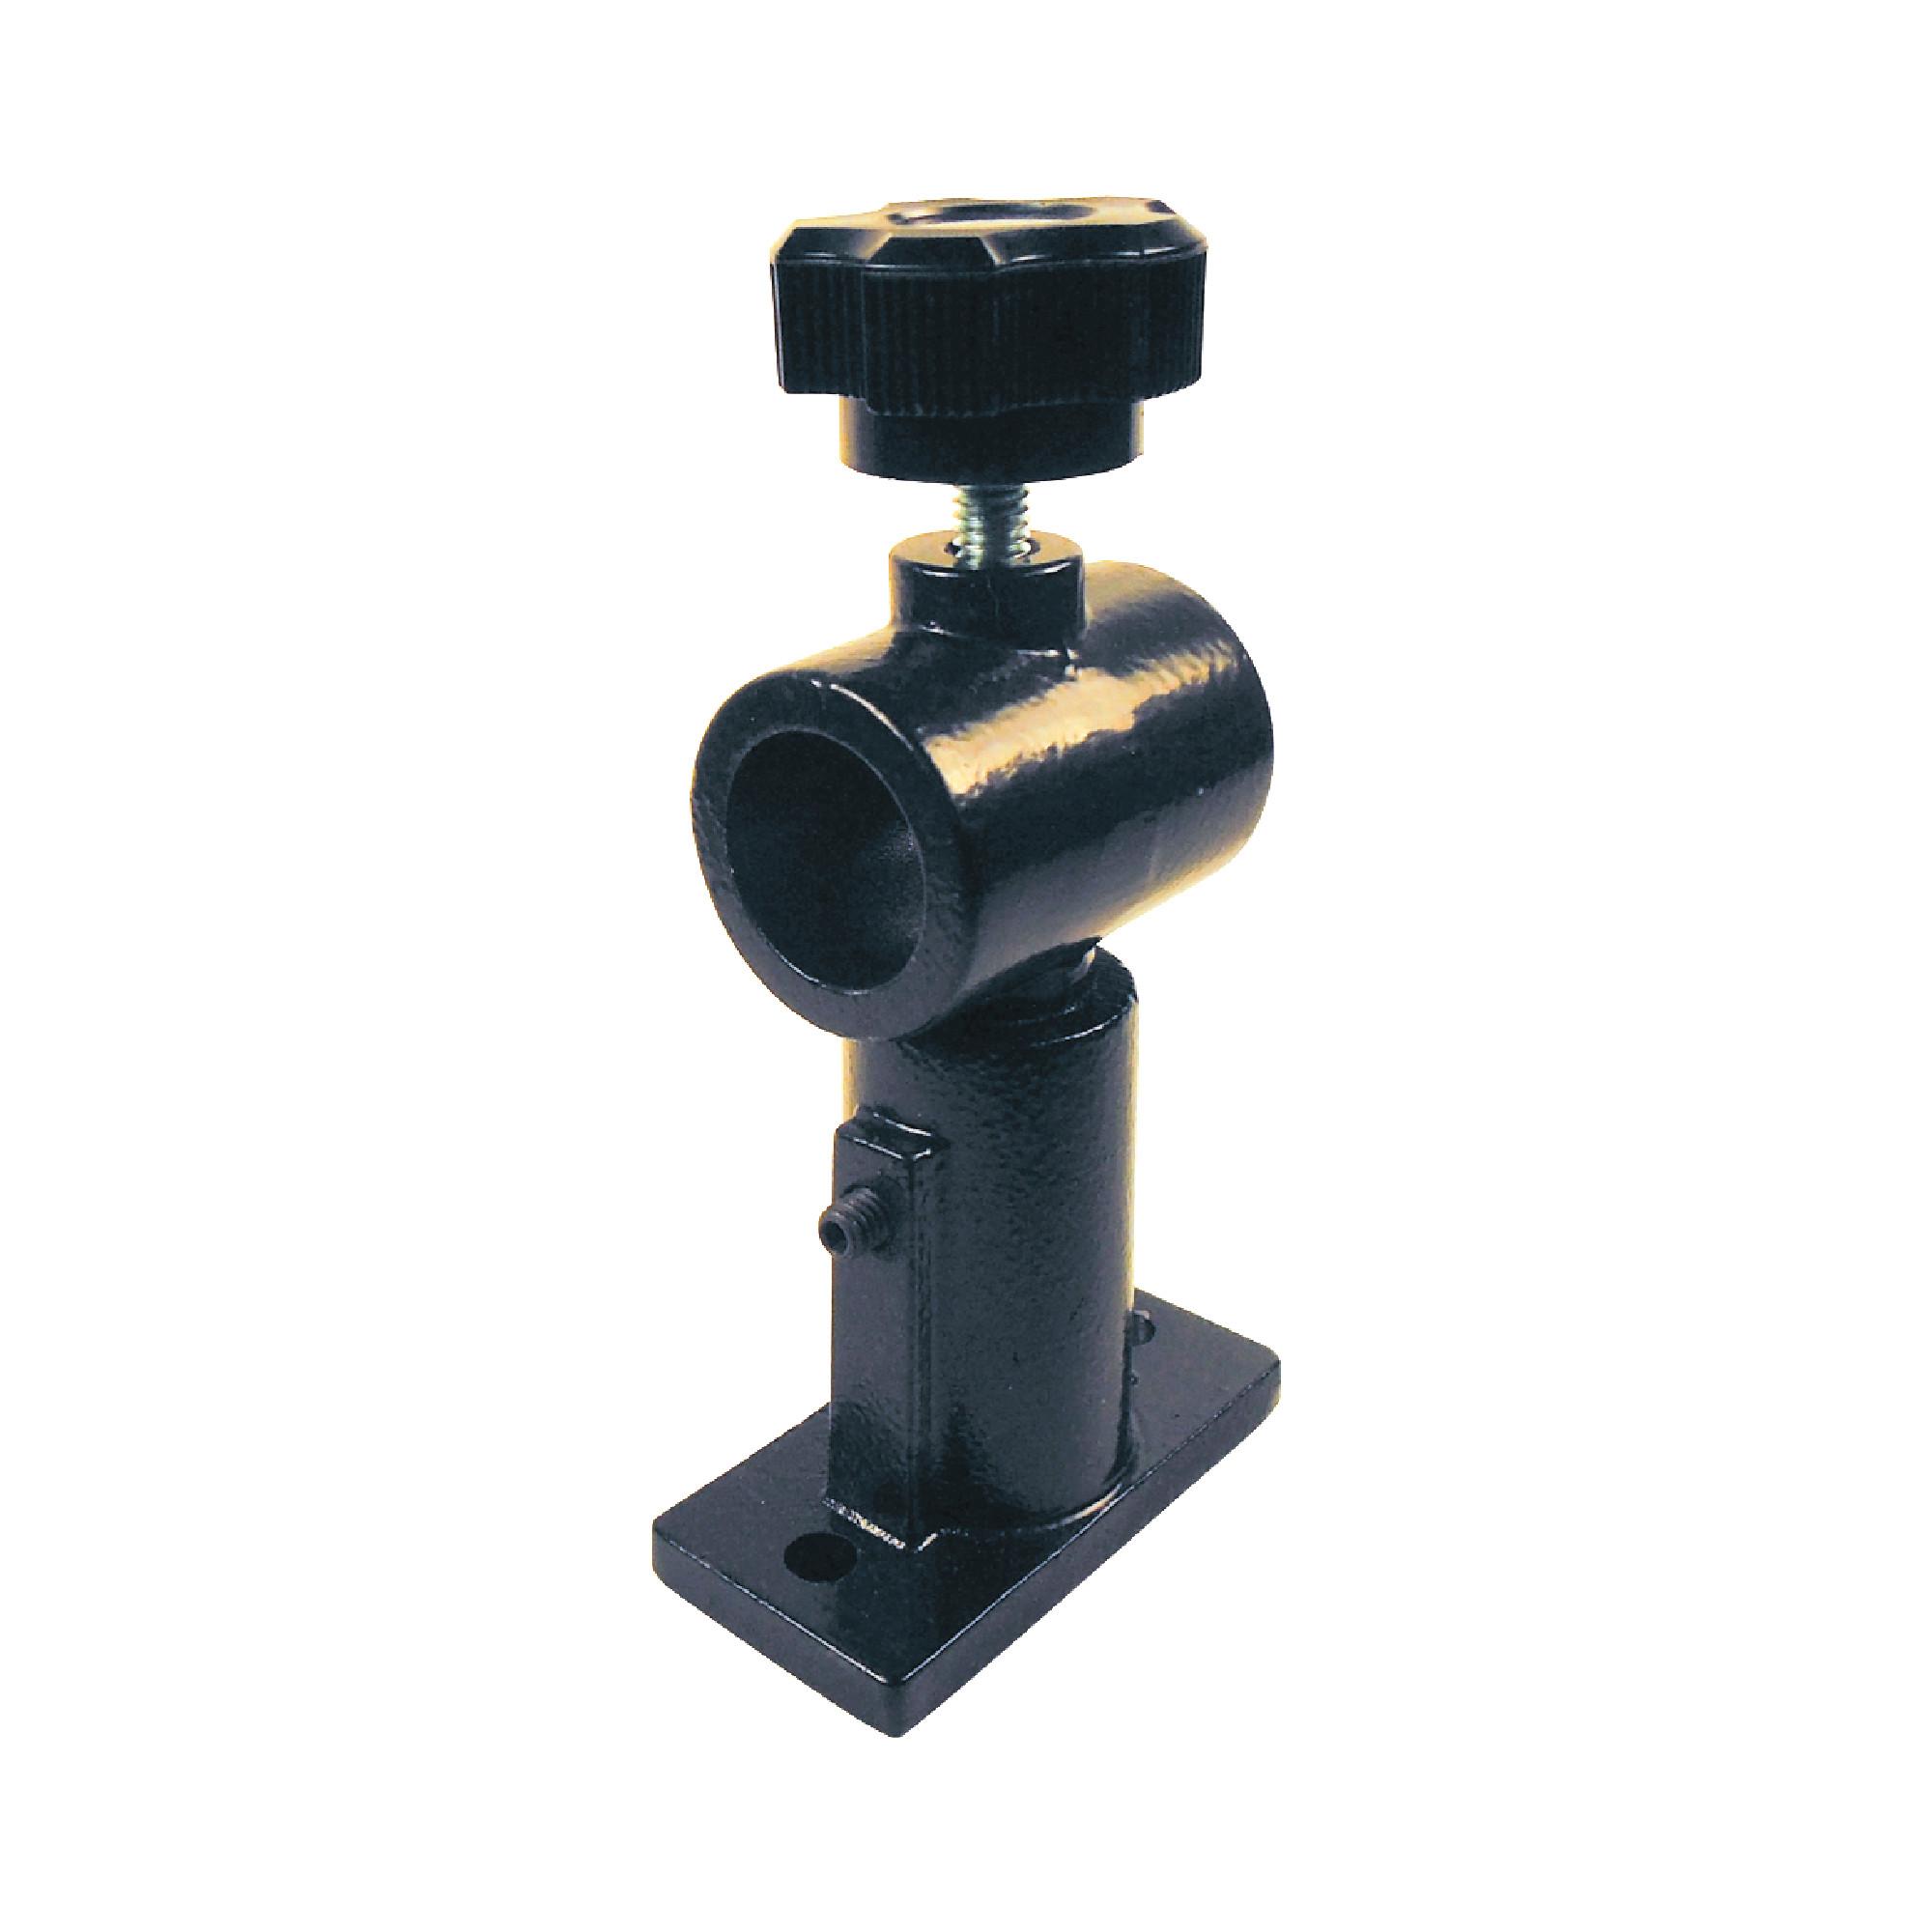 Telescoping Mounting Bracket for Latheguard Shields